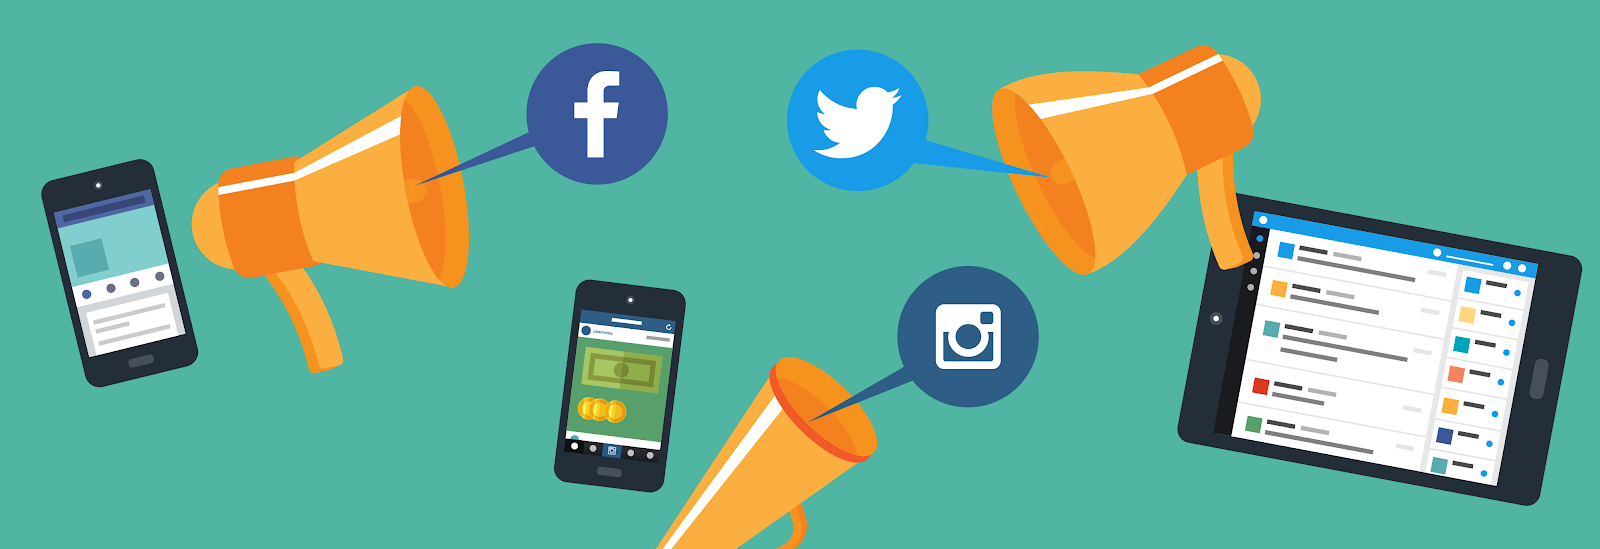 Paid advertising through social media ads   Paid Advertising Top 5 Best Strategies   getdigitaloffice.com